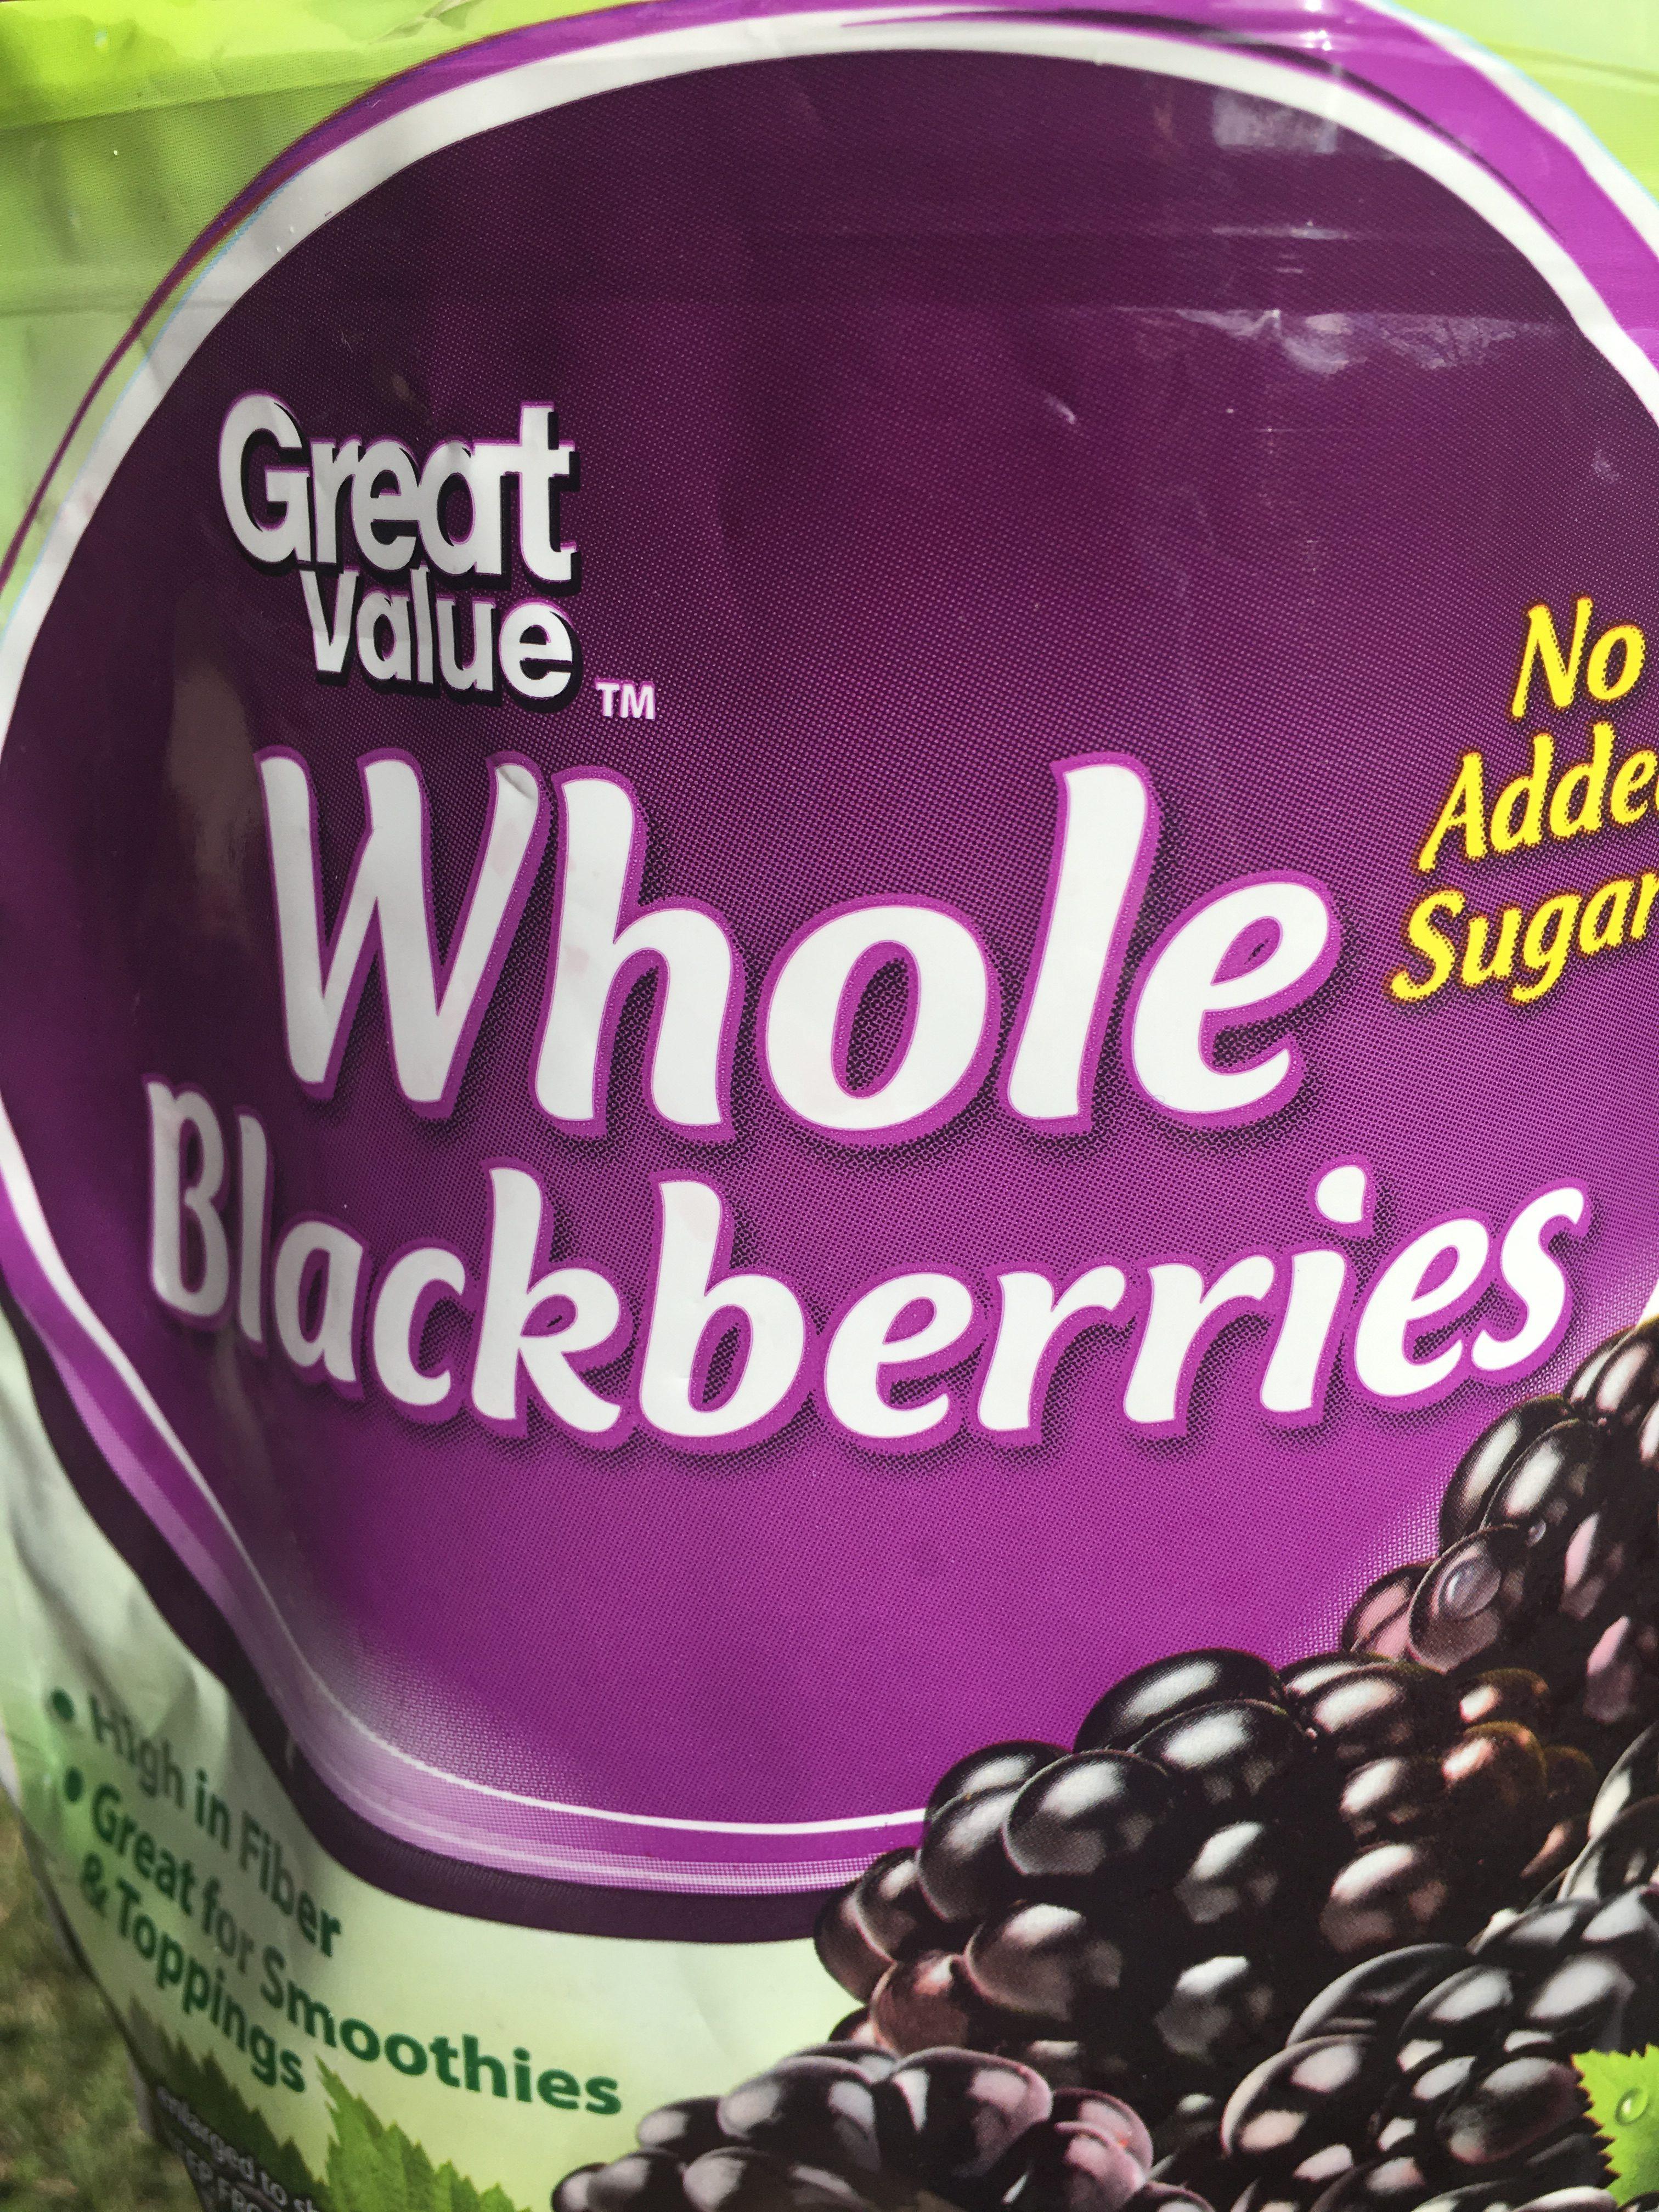 Frozen Blackberries are a great shortcut!